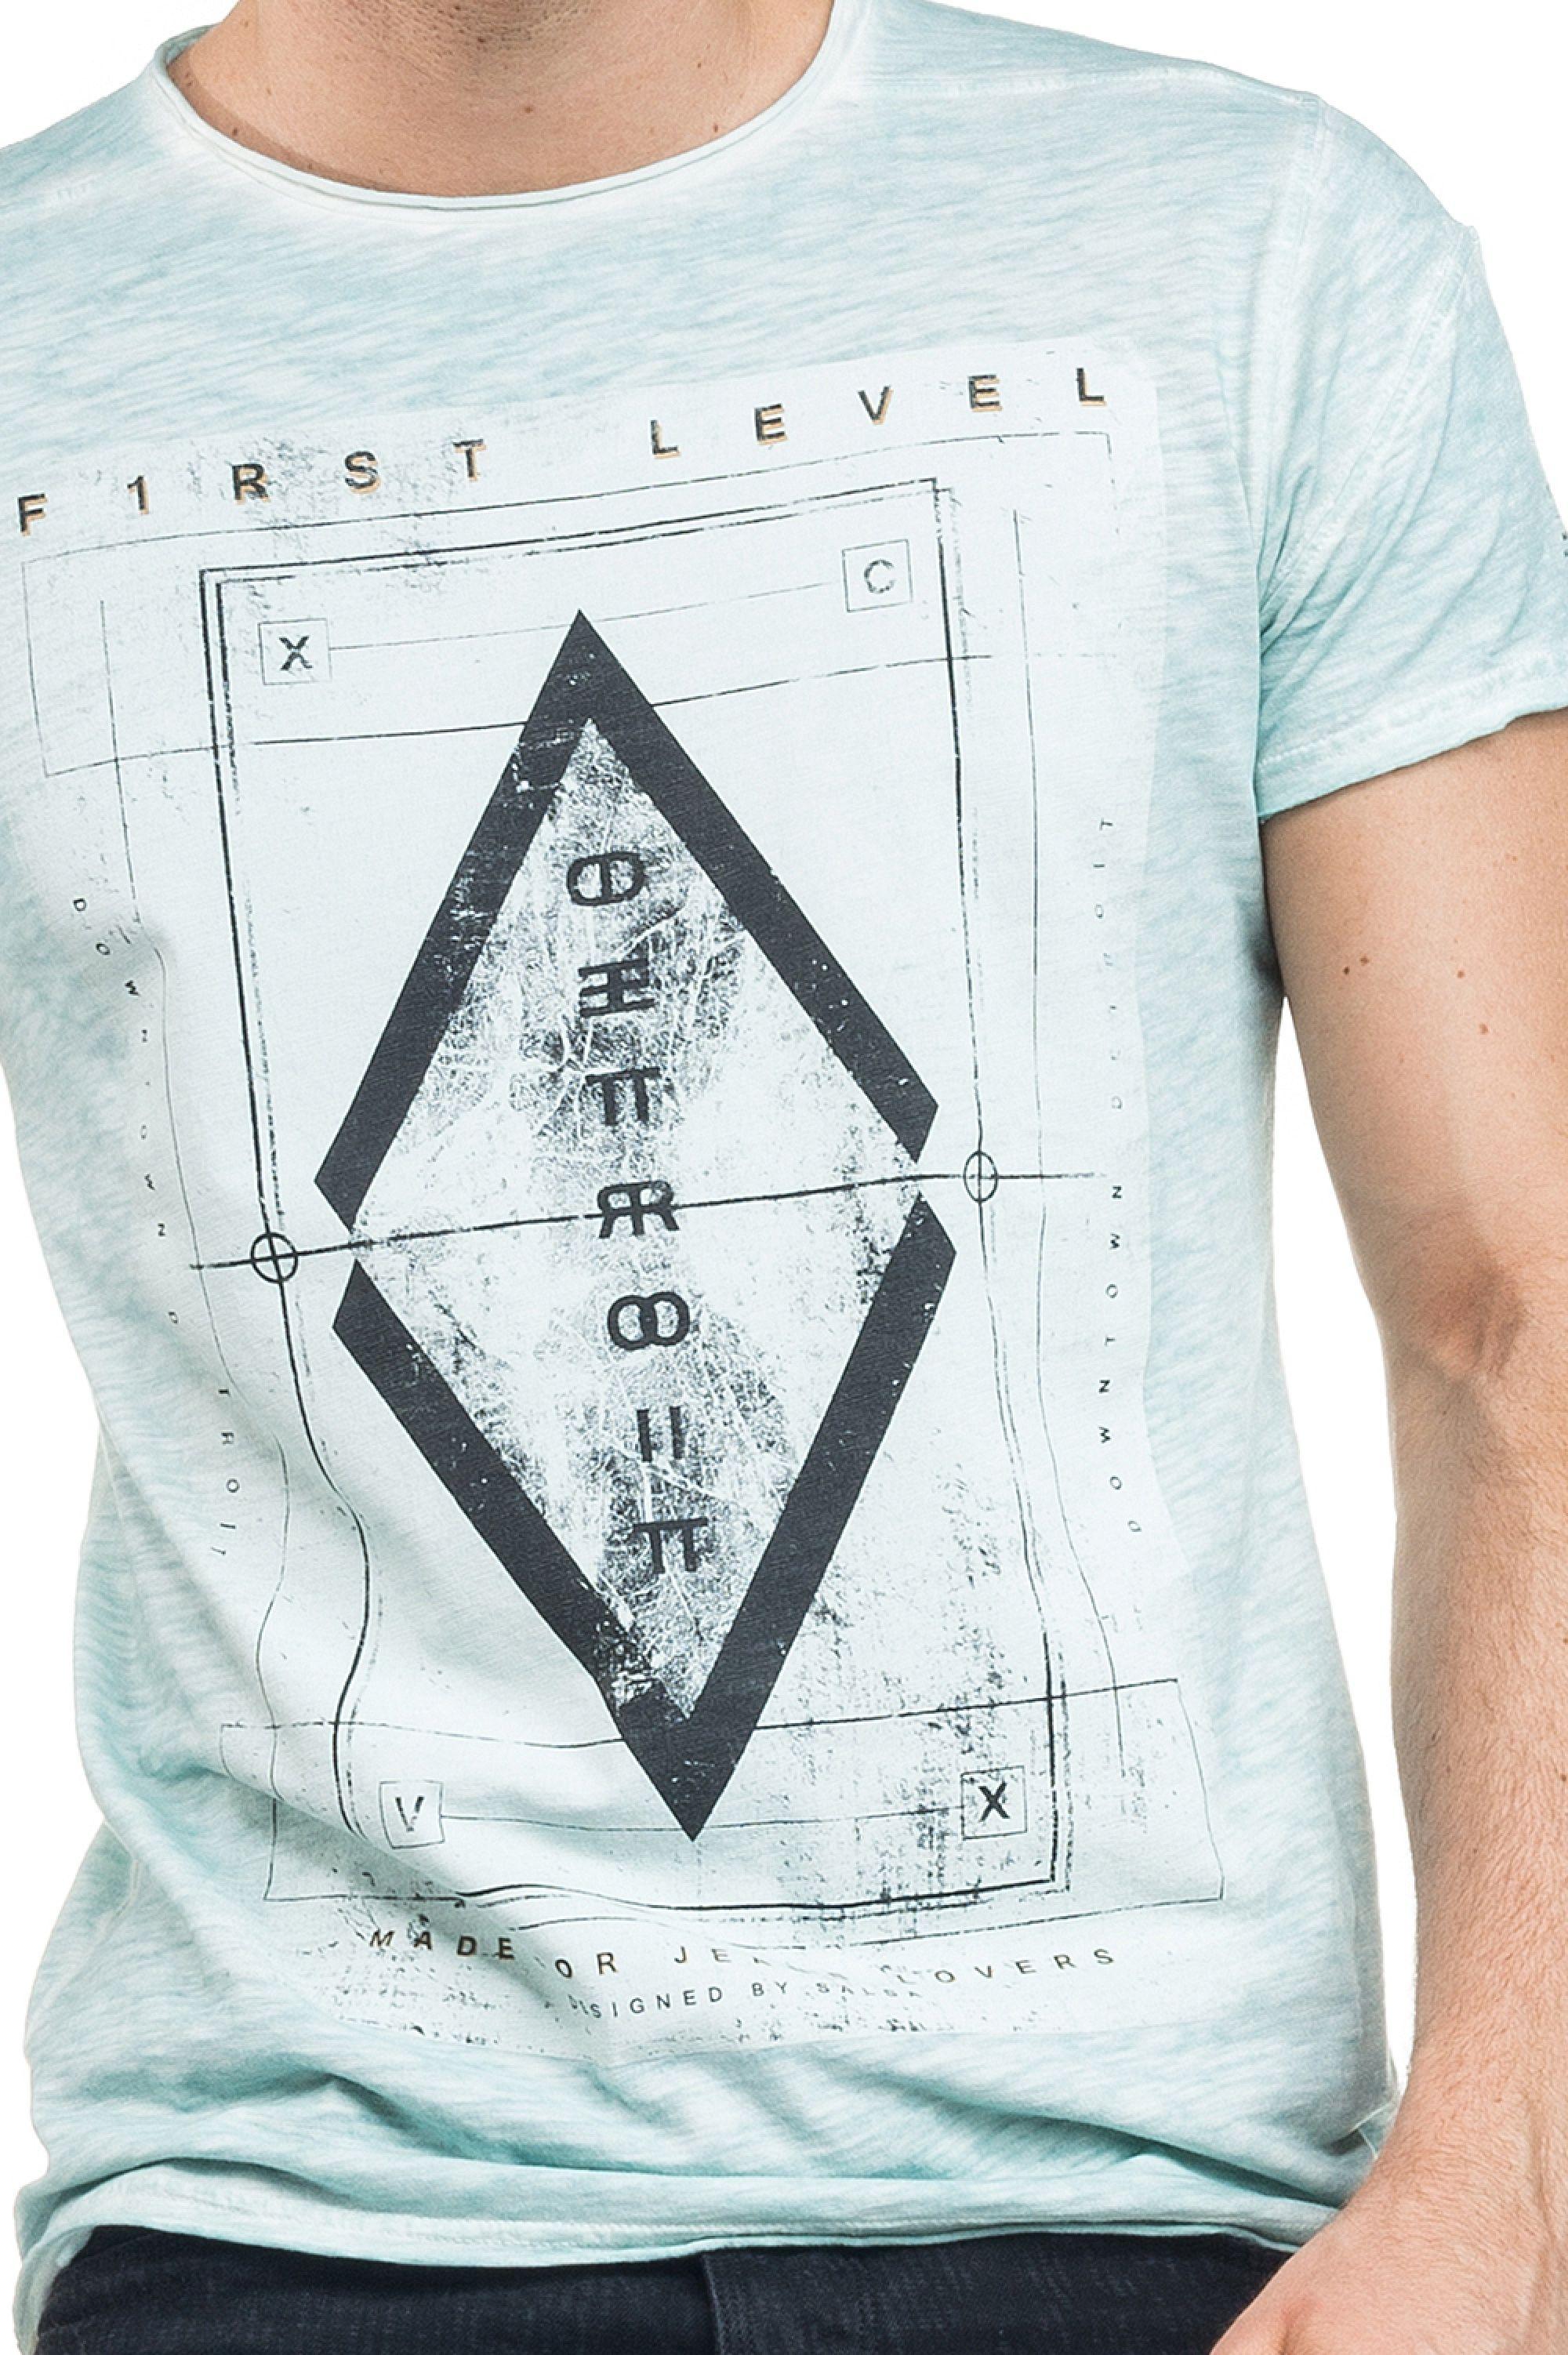 fbfe356c143 T-shirt 1st level tingida